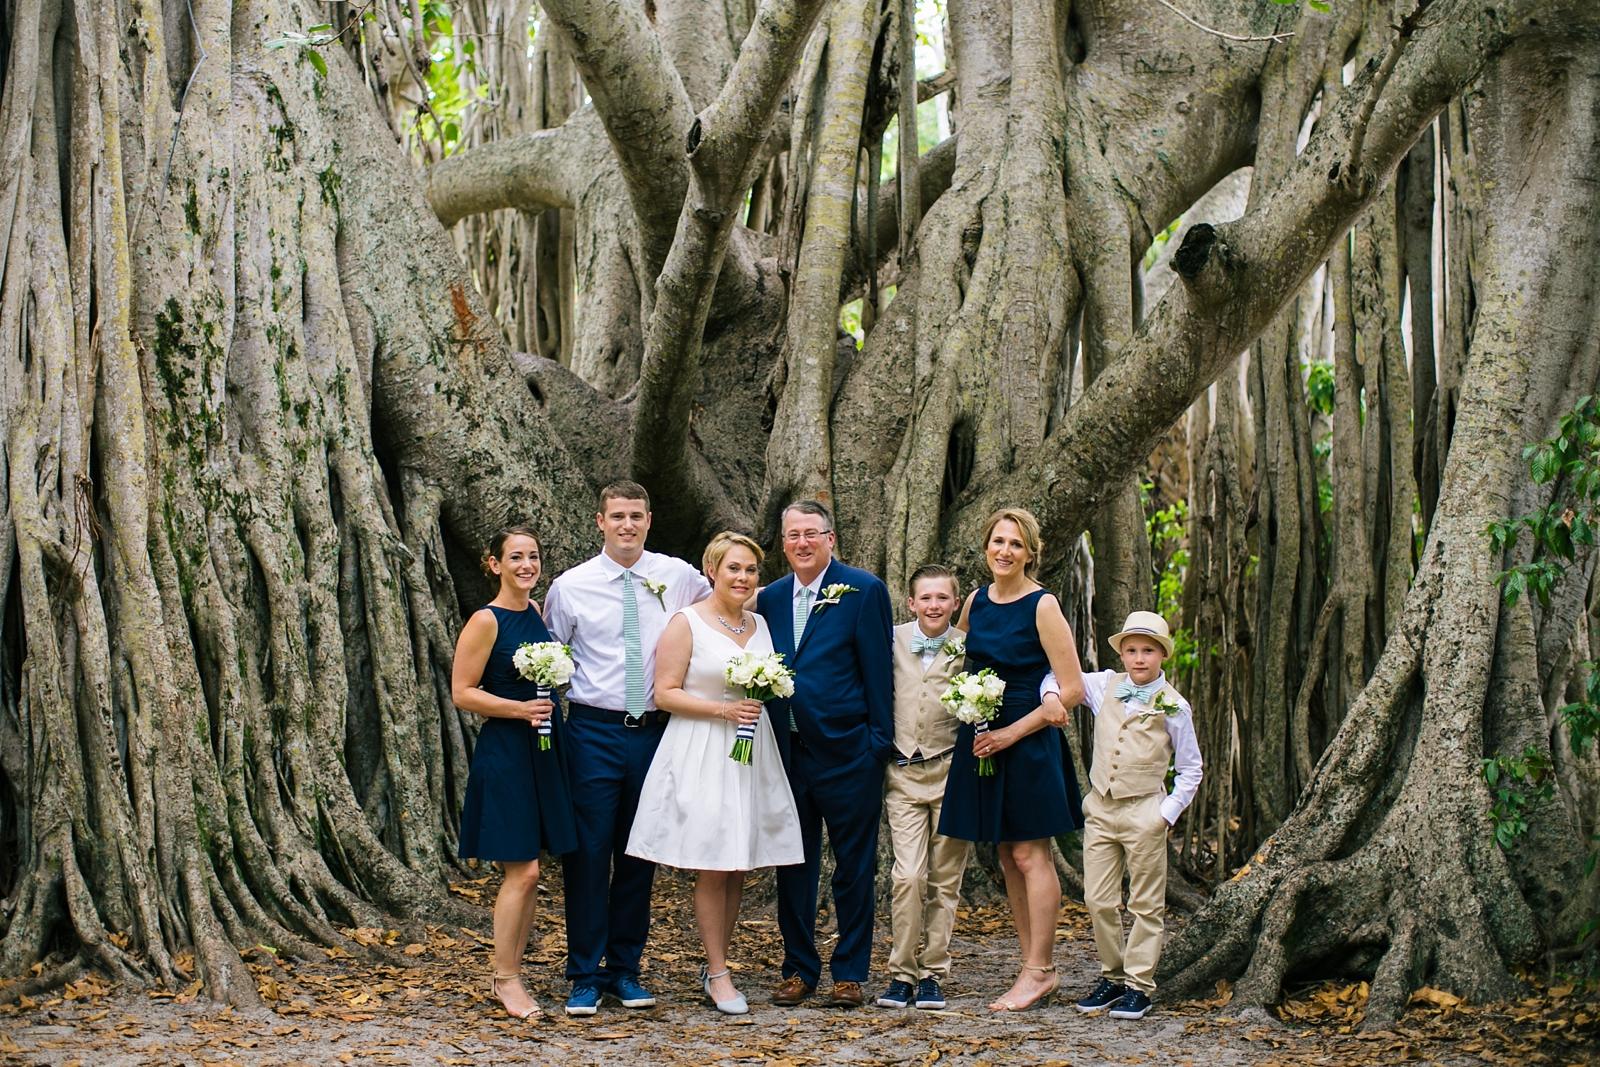 08-los-angeles-wedding-photographer-fort-lauderdale.jpg